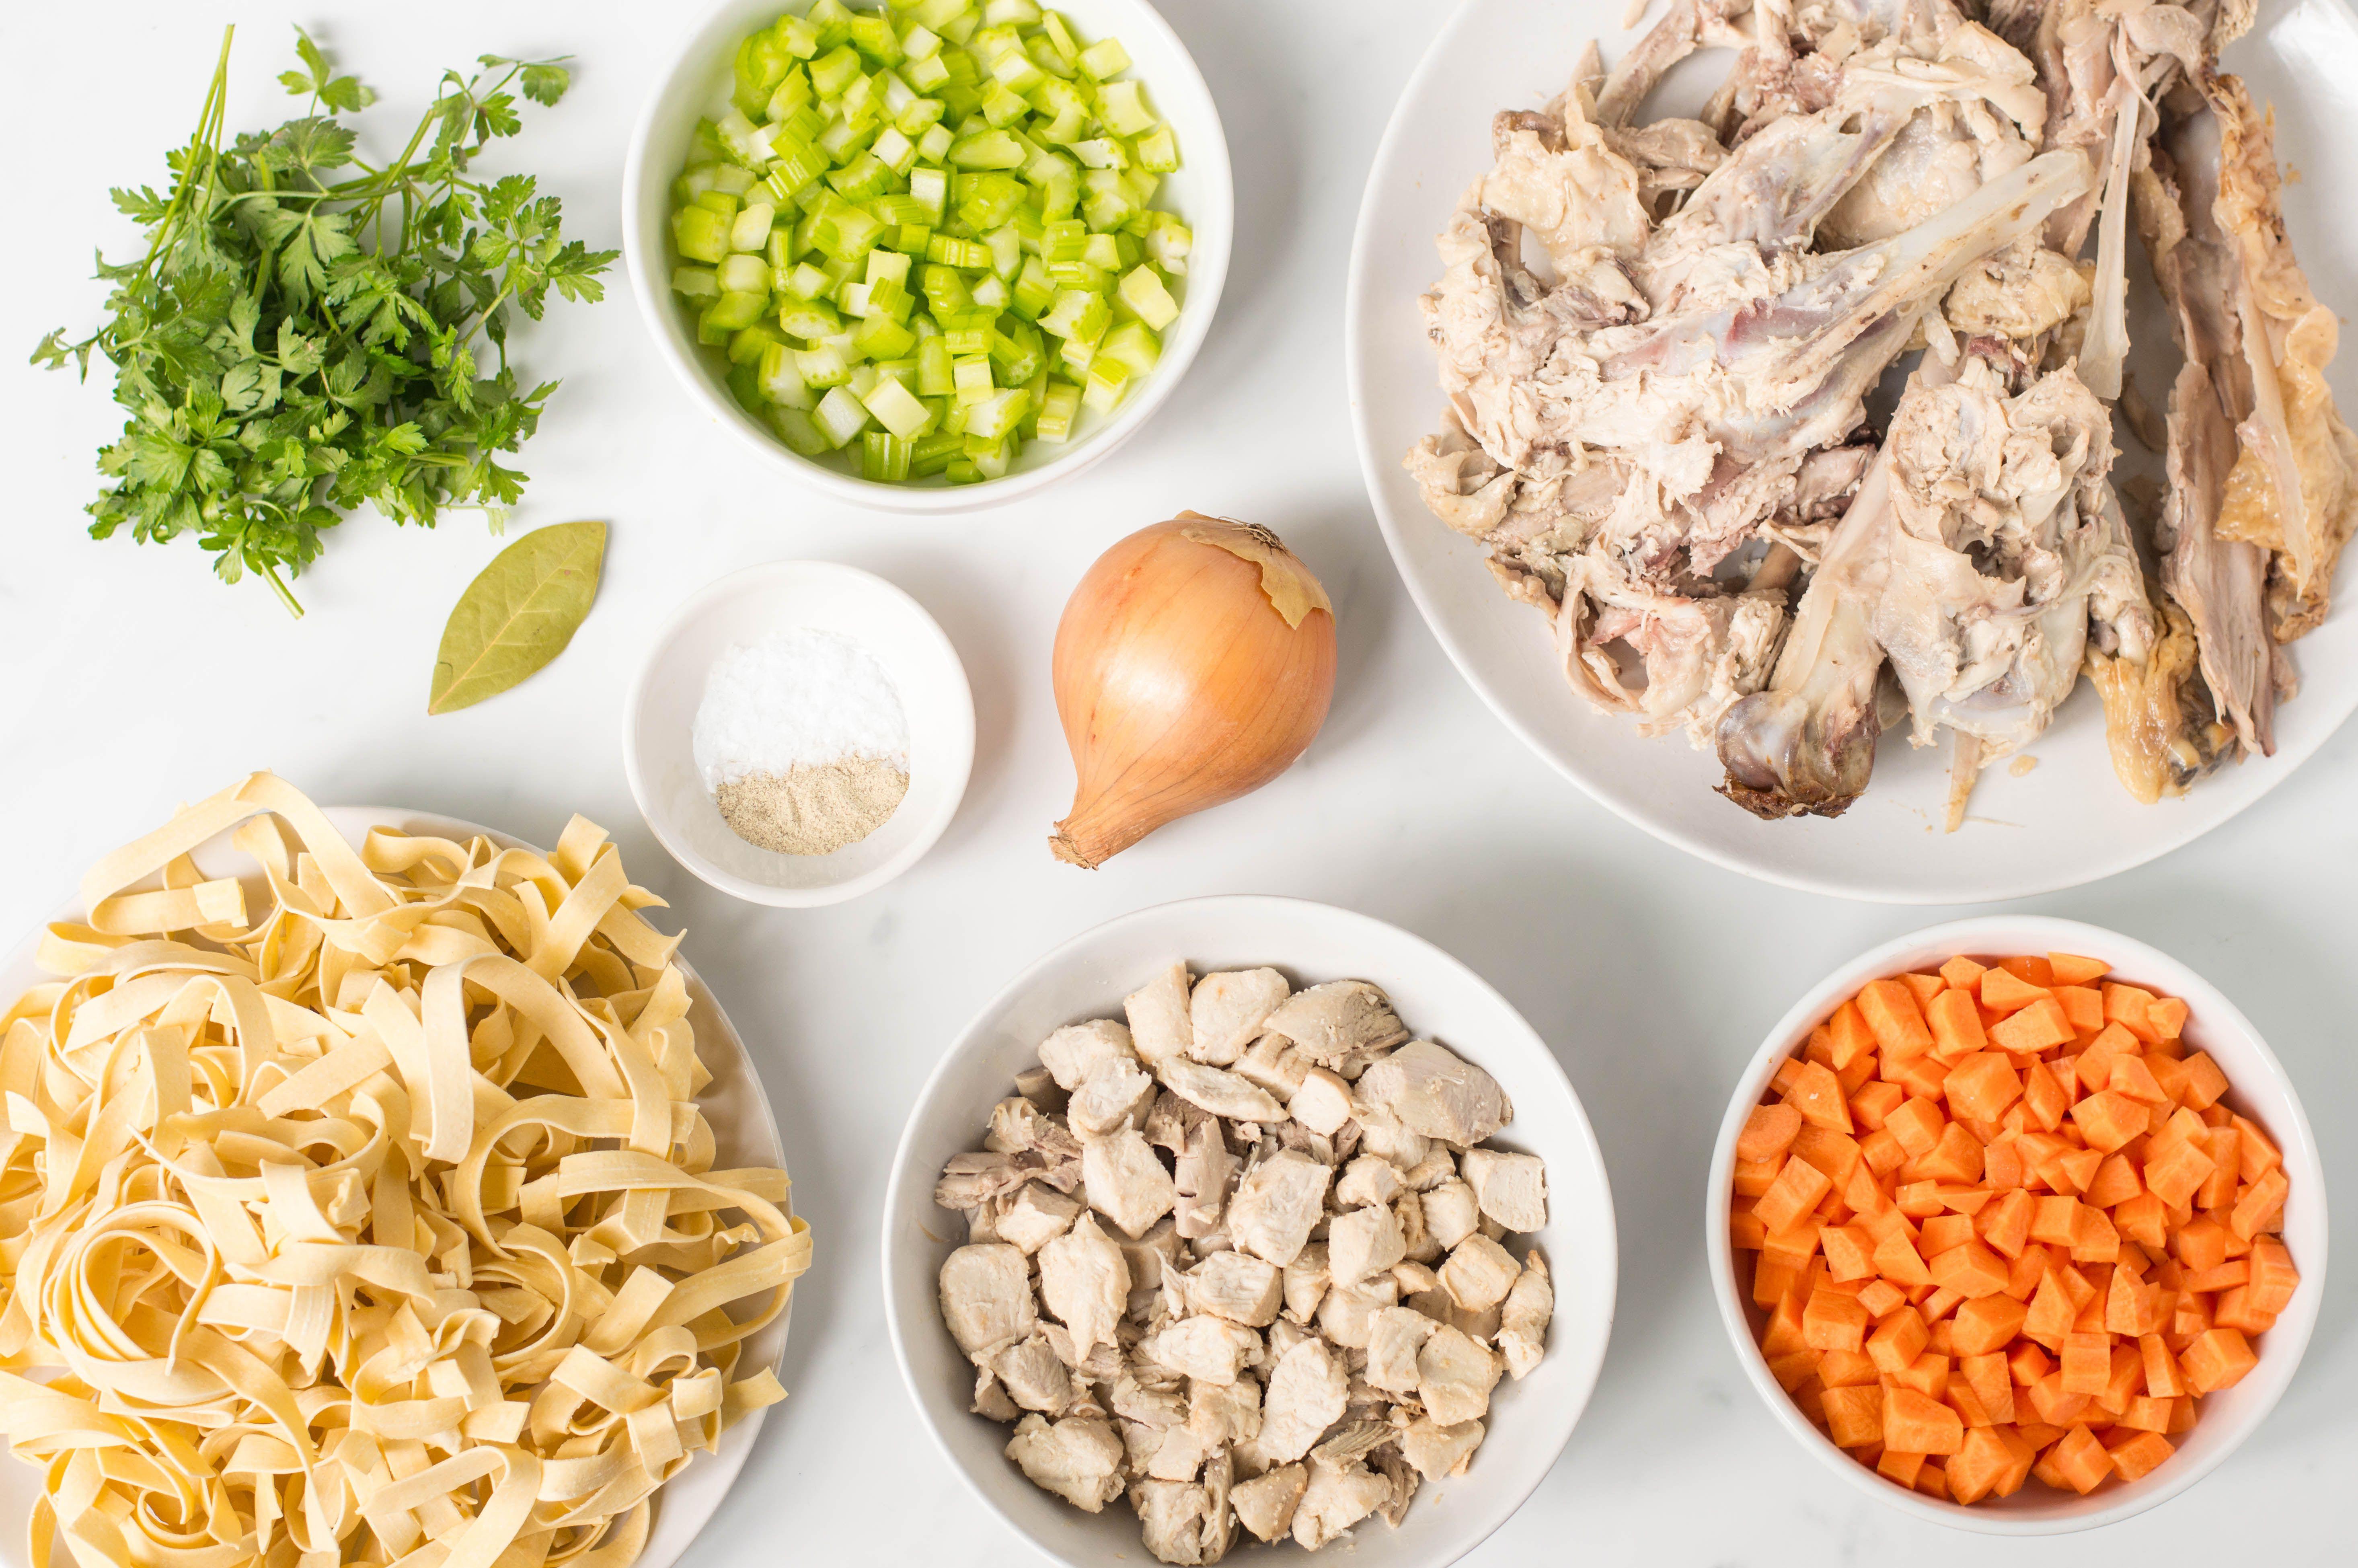 Turkey Noodle Soup Recipe ingredients